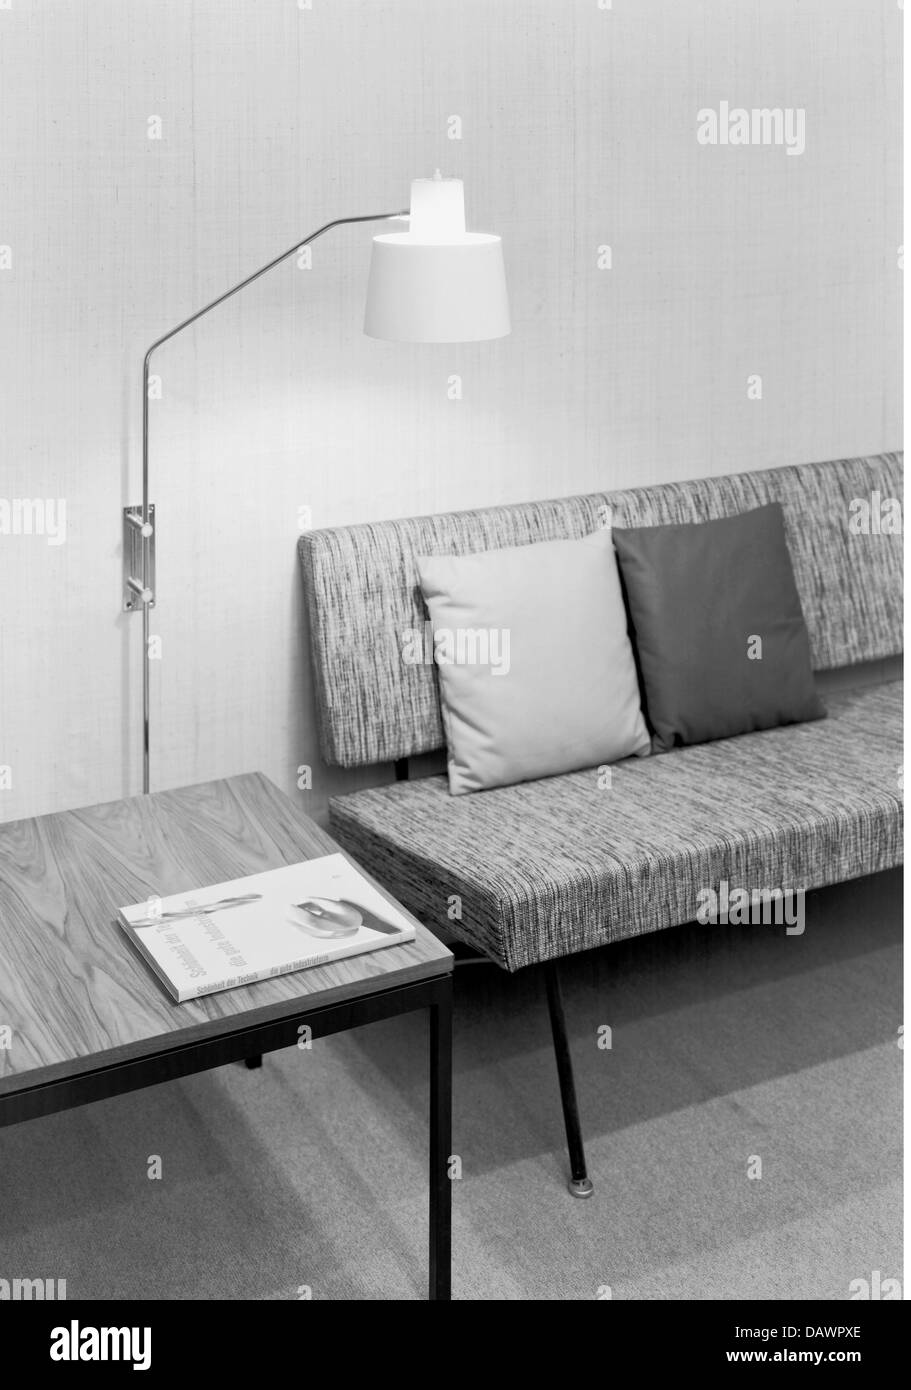 1960s 1960 Stock Photos & 1960s 1960 Stock Images - Alamy